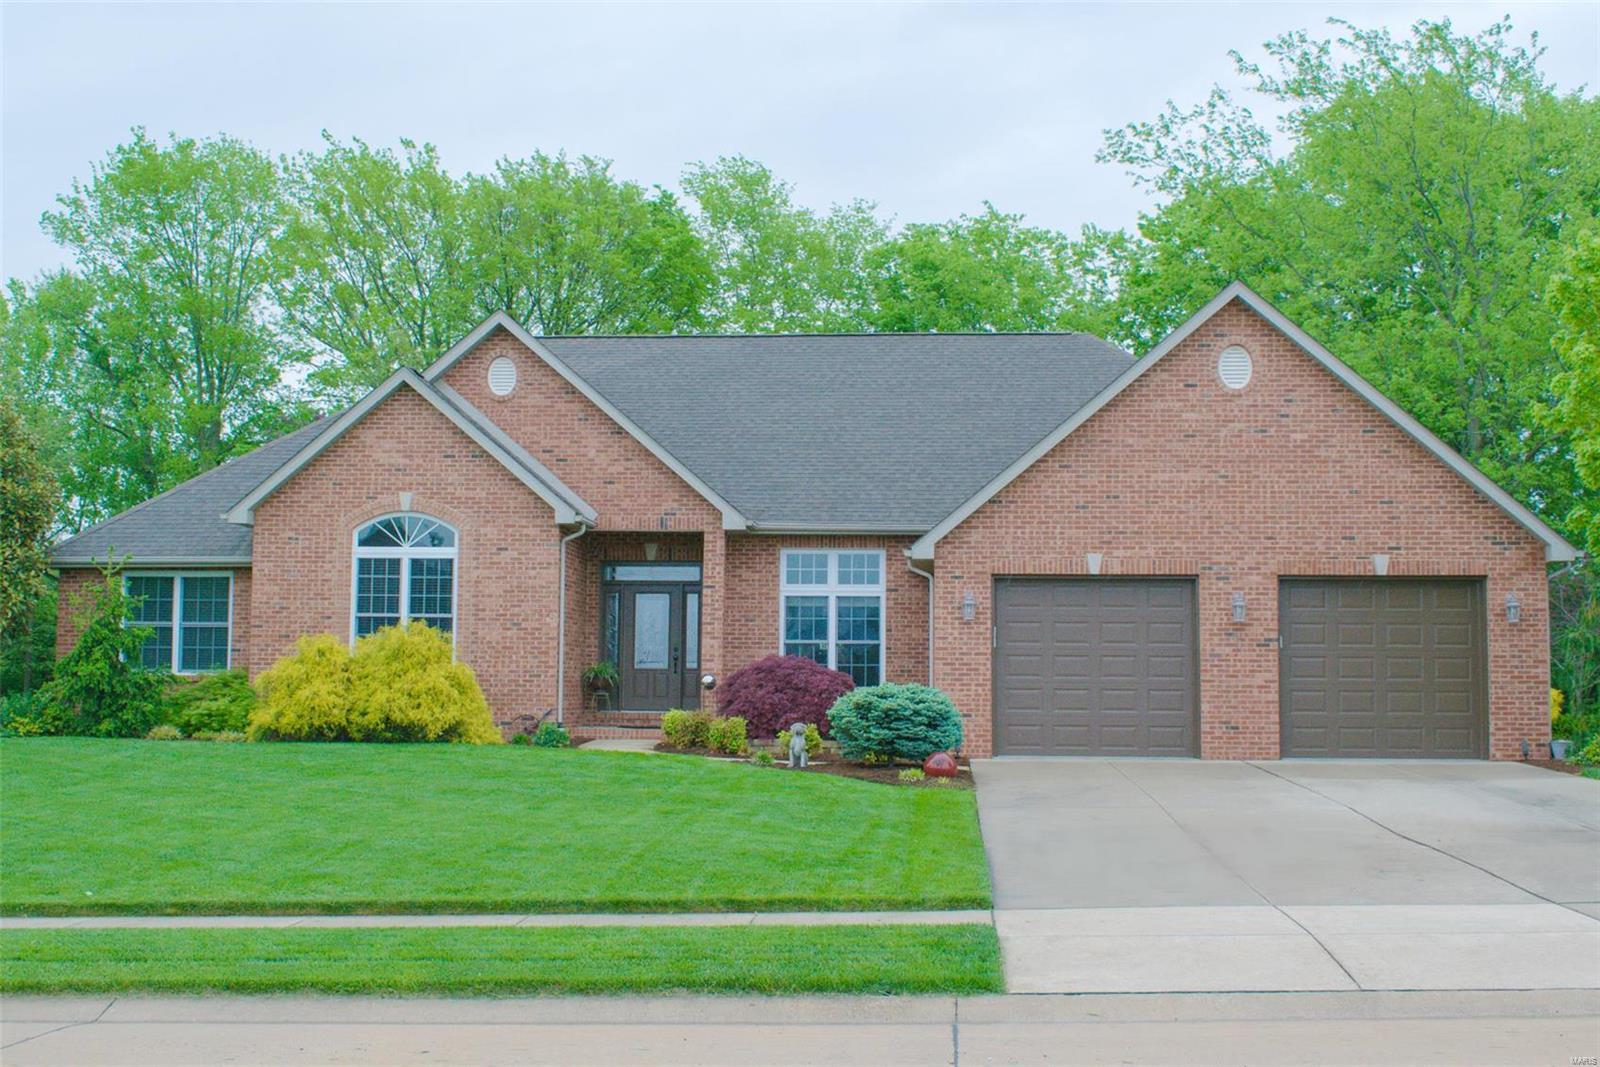 1624 Timber Ridge Property Photo - Columbia, IL real estate listing